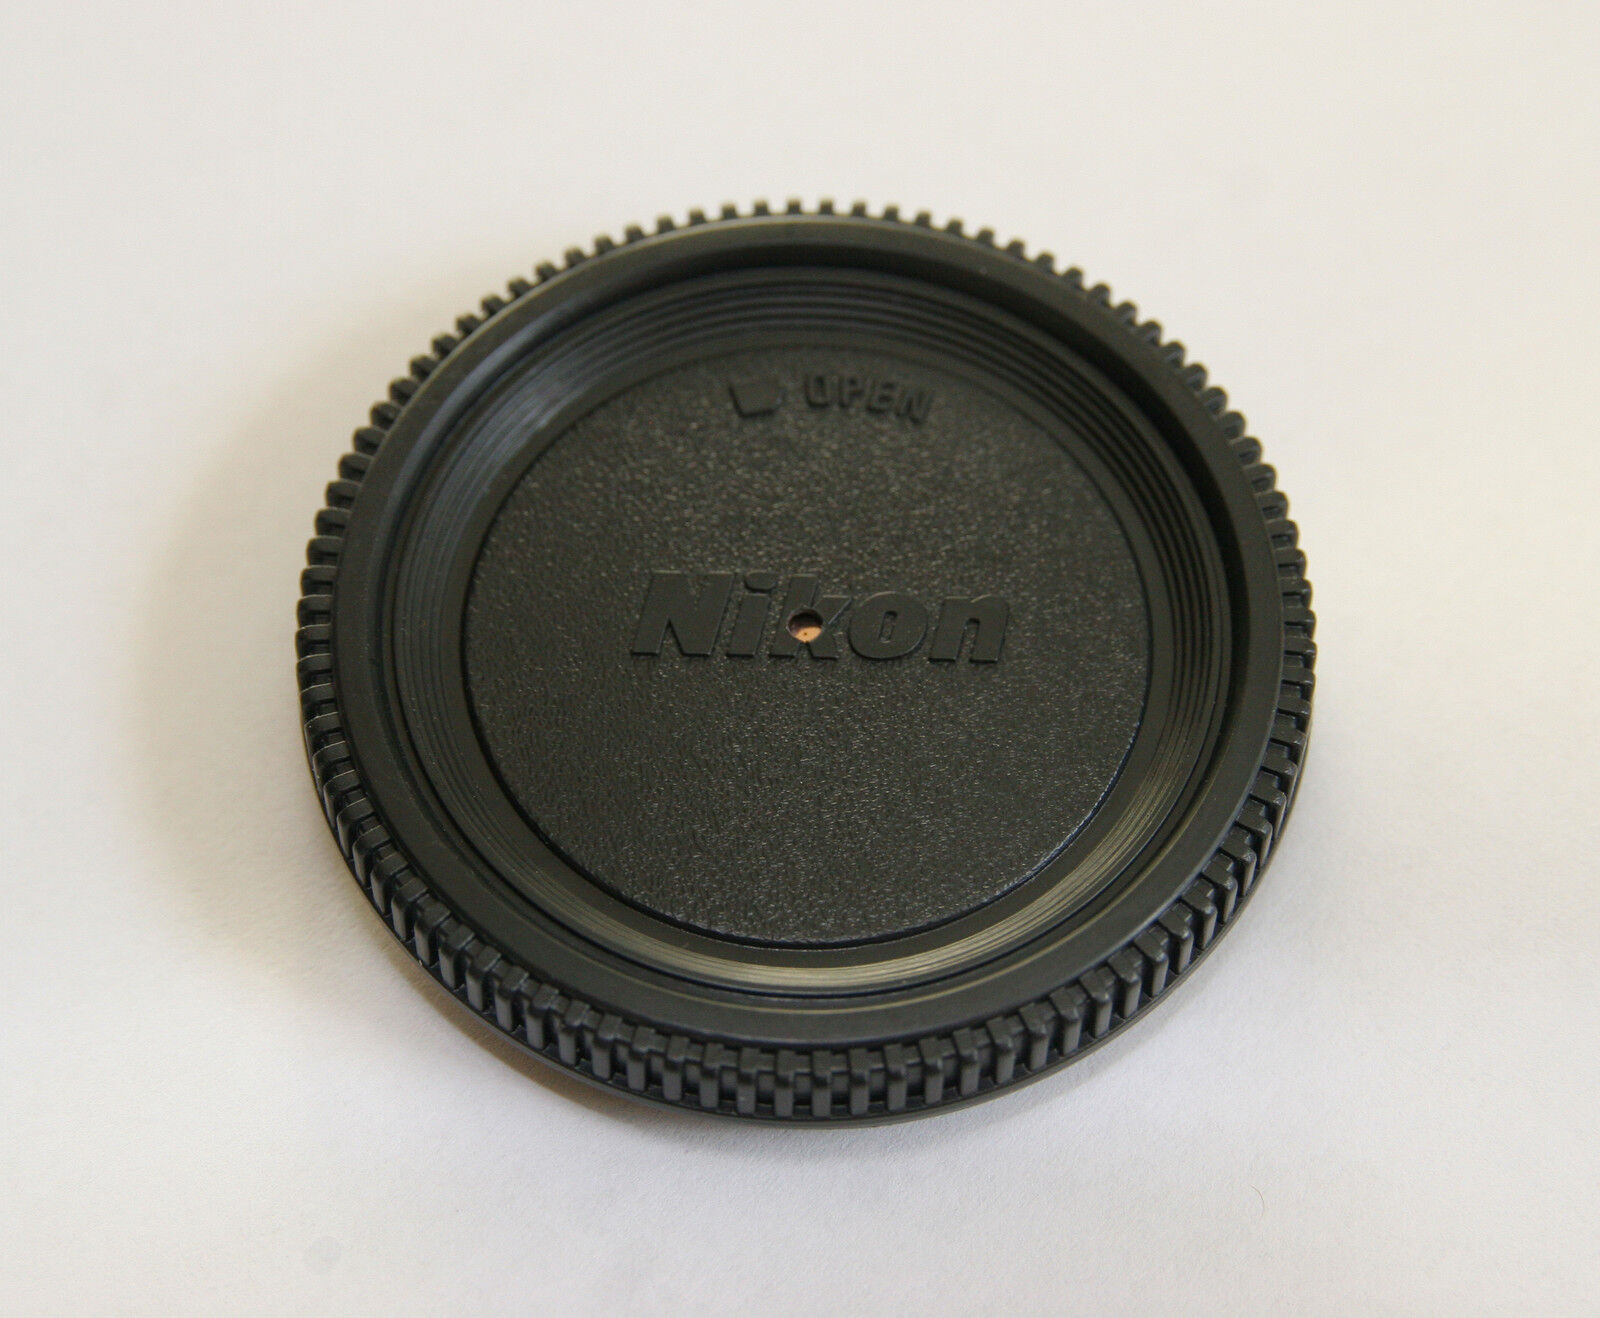 Nikon F Dustless Pinhole Lens Body Cap Camera Photography Lomo Lomogoraphy